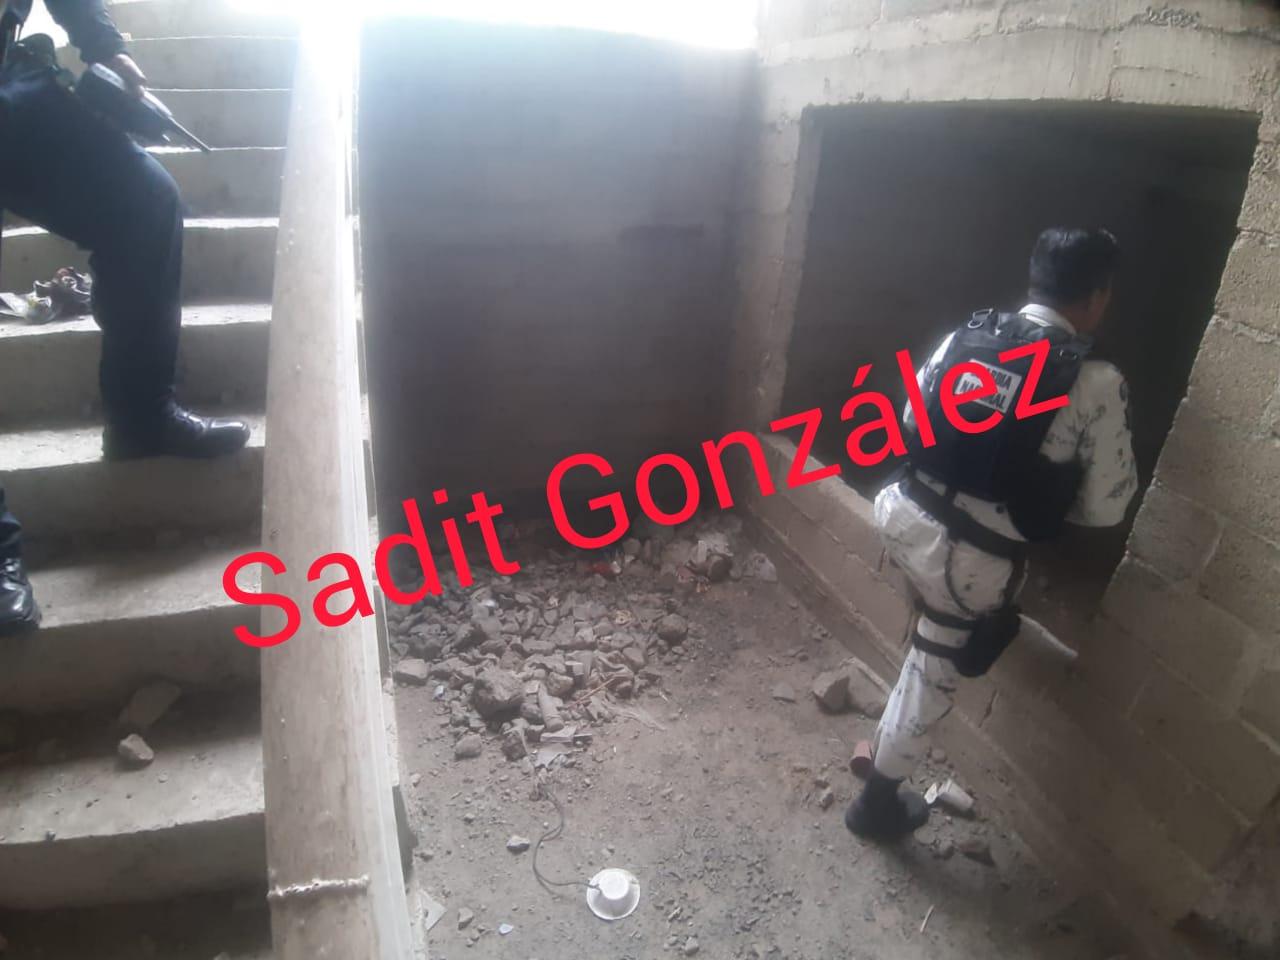 Hallan huachitunel en Tepatlaxco, San Martín Texmelucan